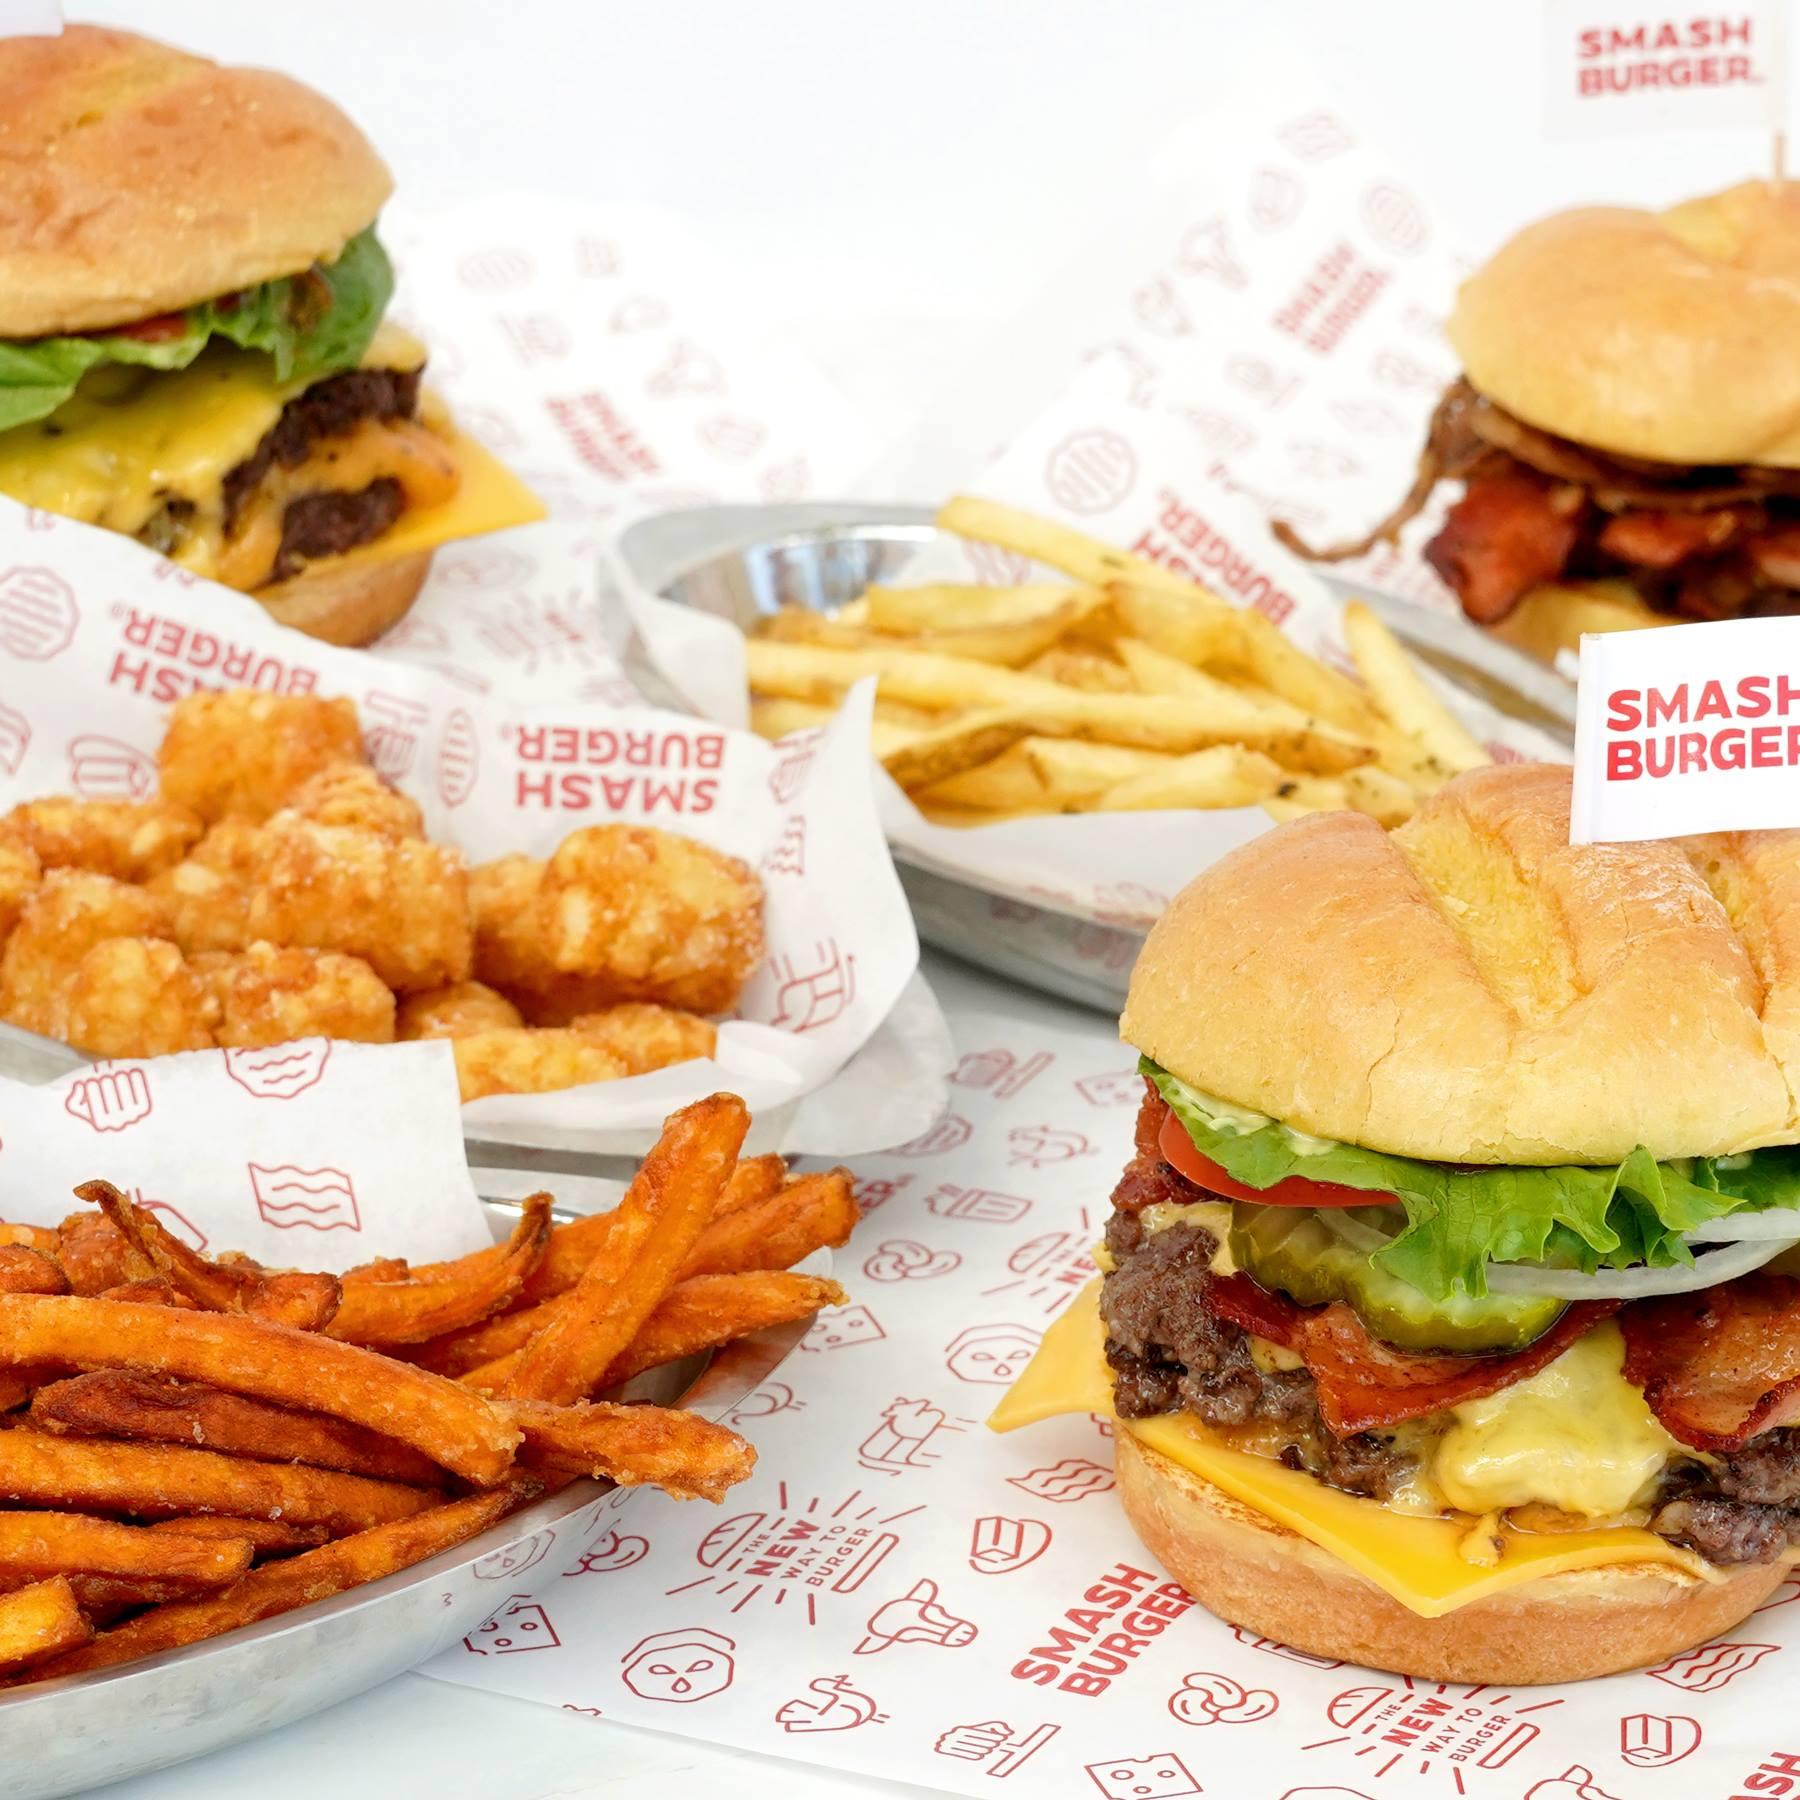 Get a 12 cent Smashburger today